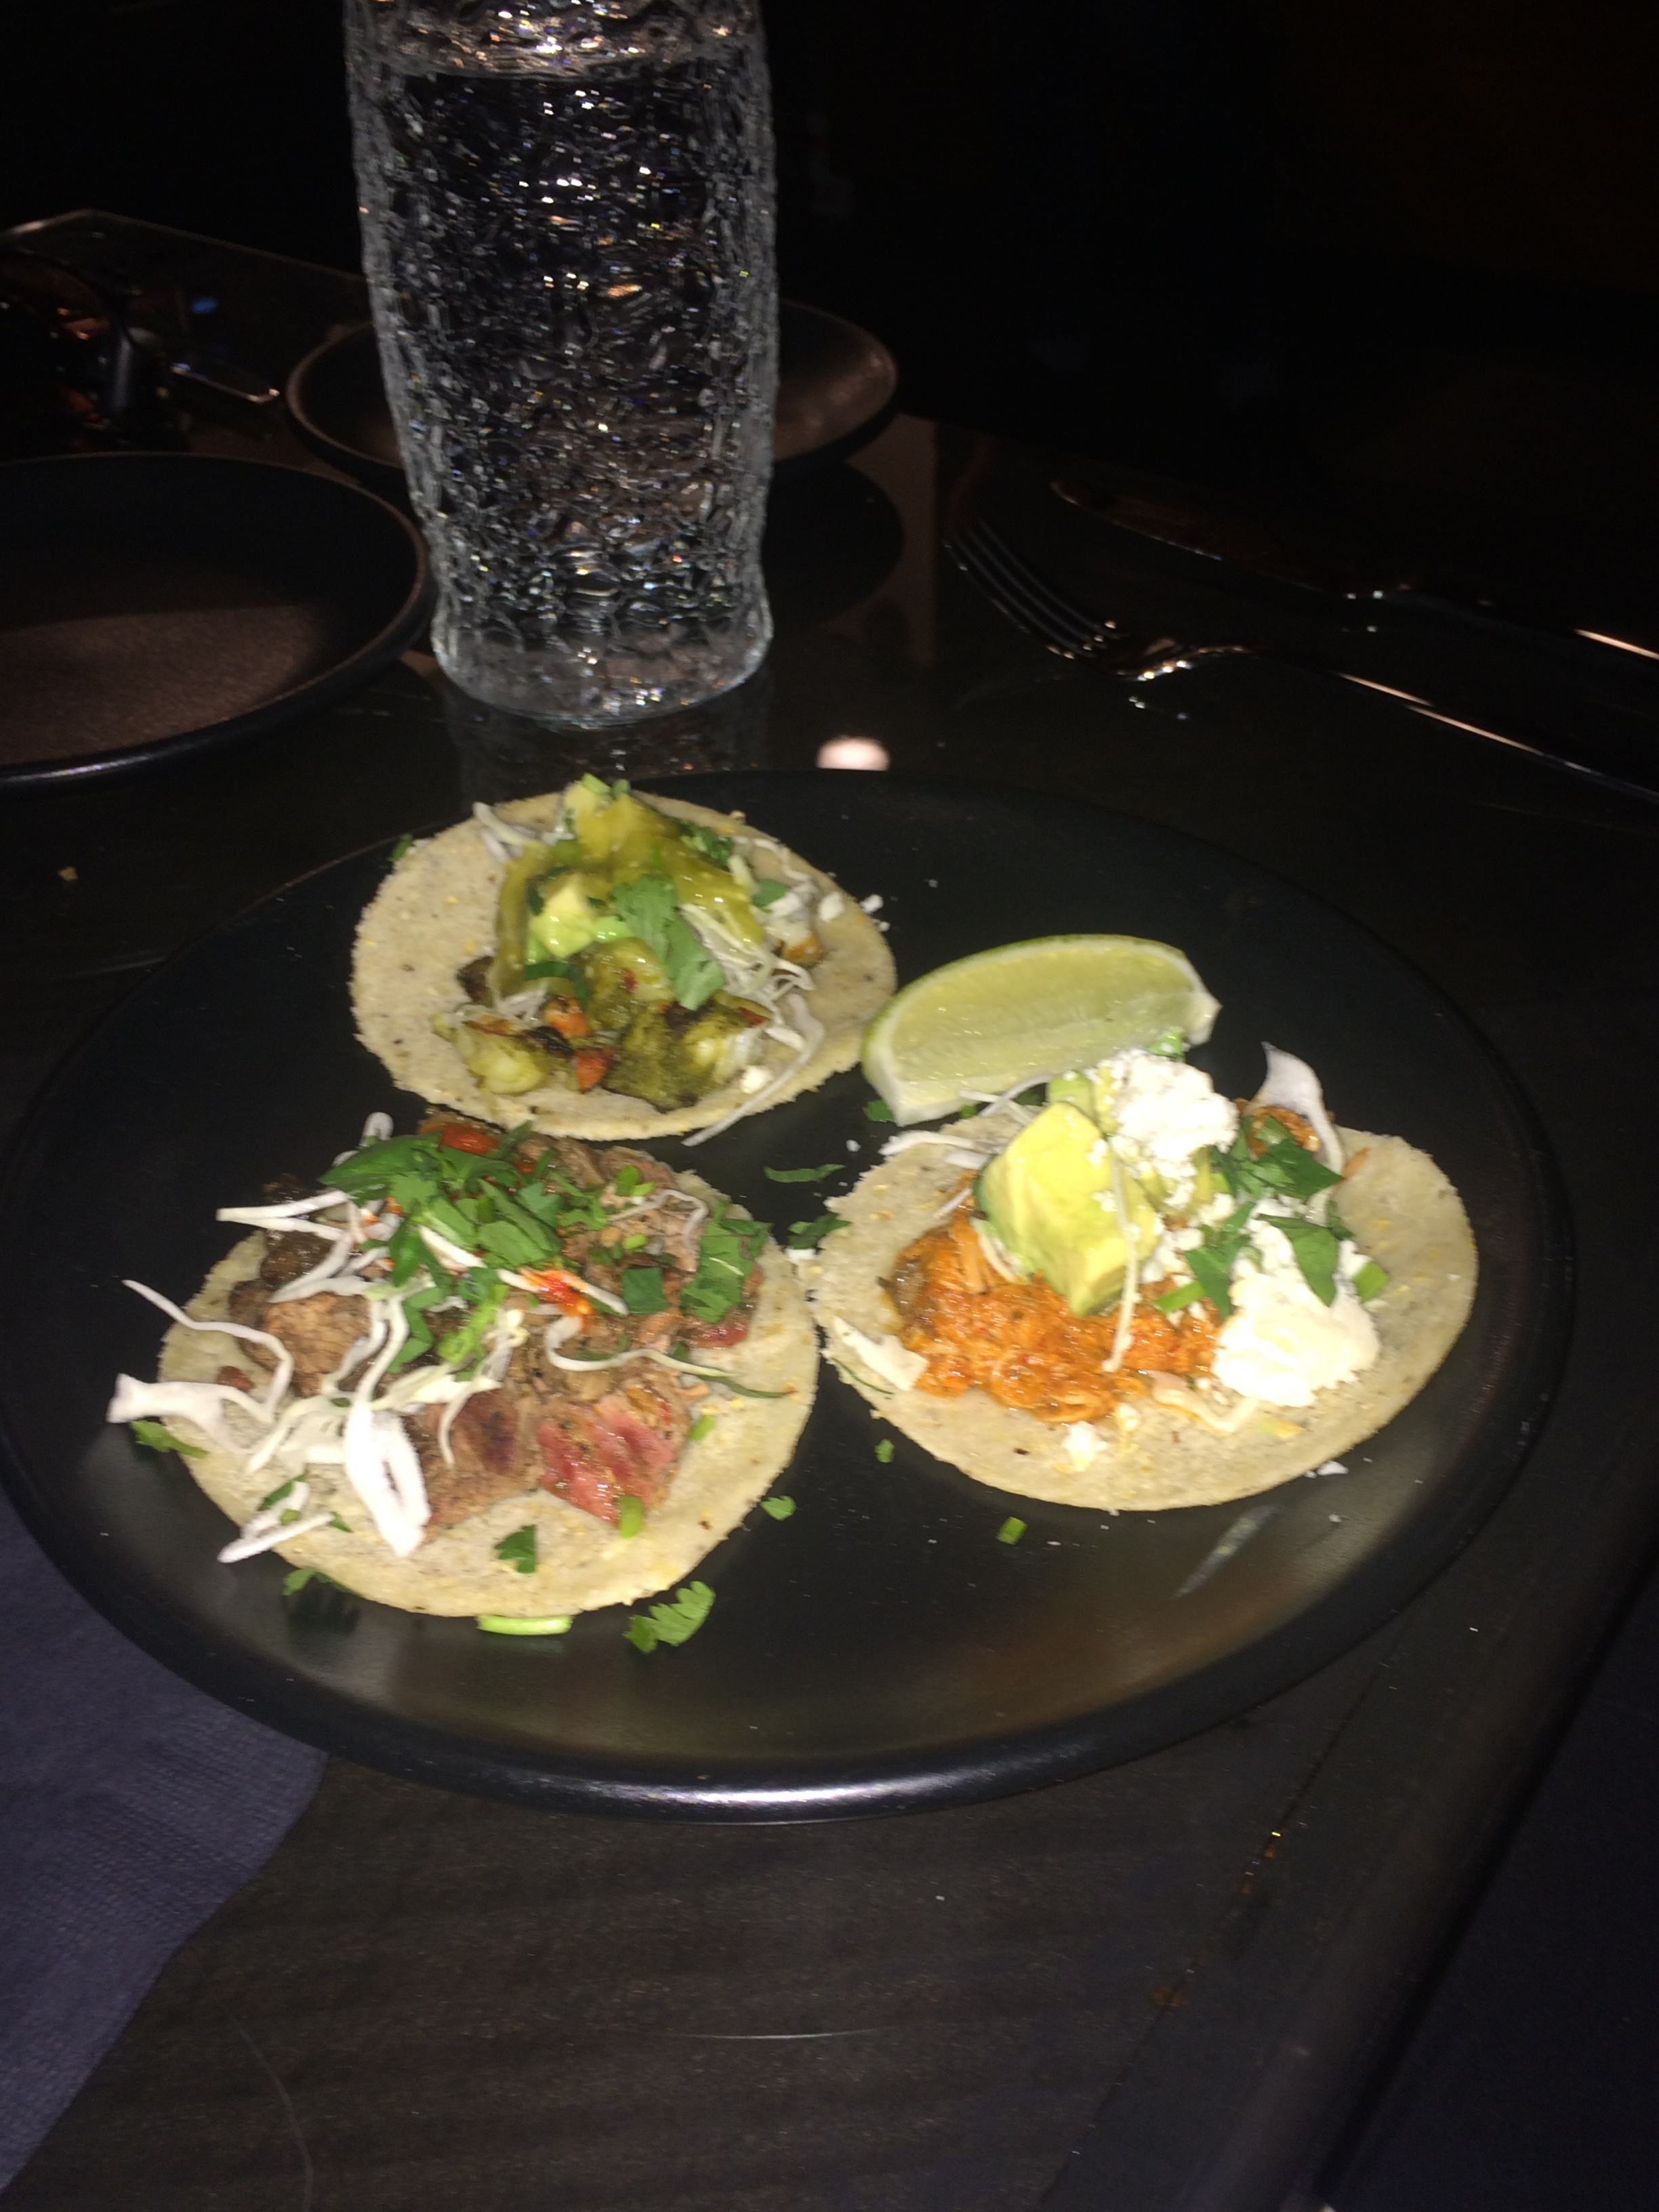 Lots of tacos